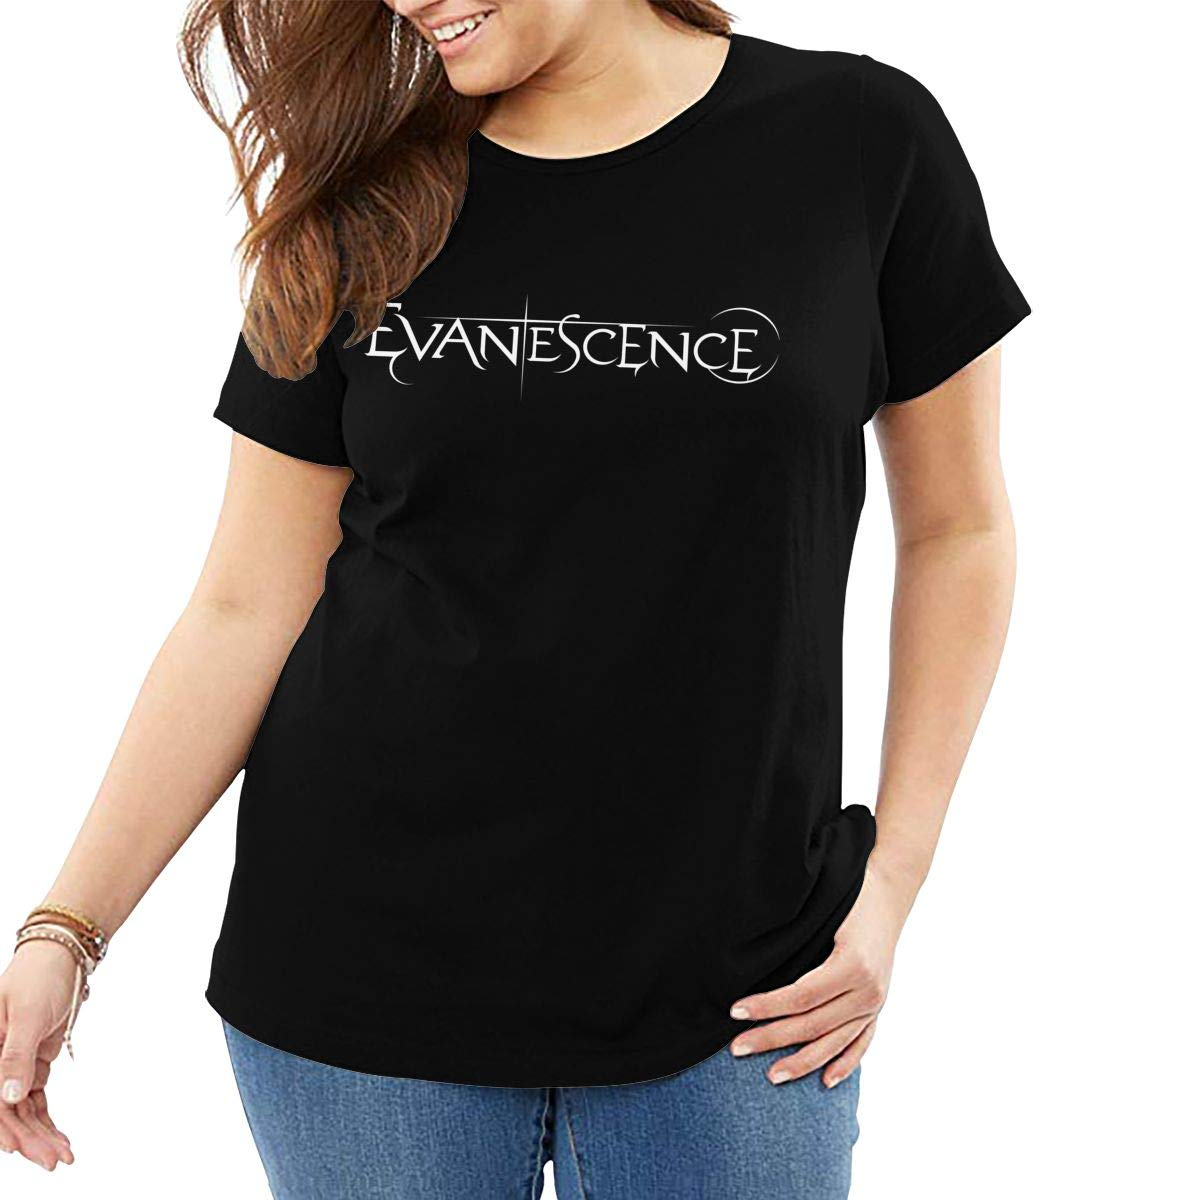 Evanescence Summer Classic Big Short Sleeve Black Shirts